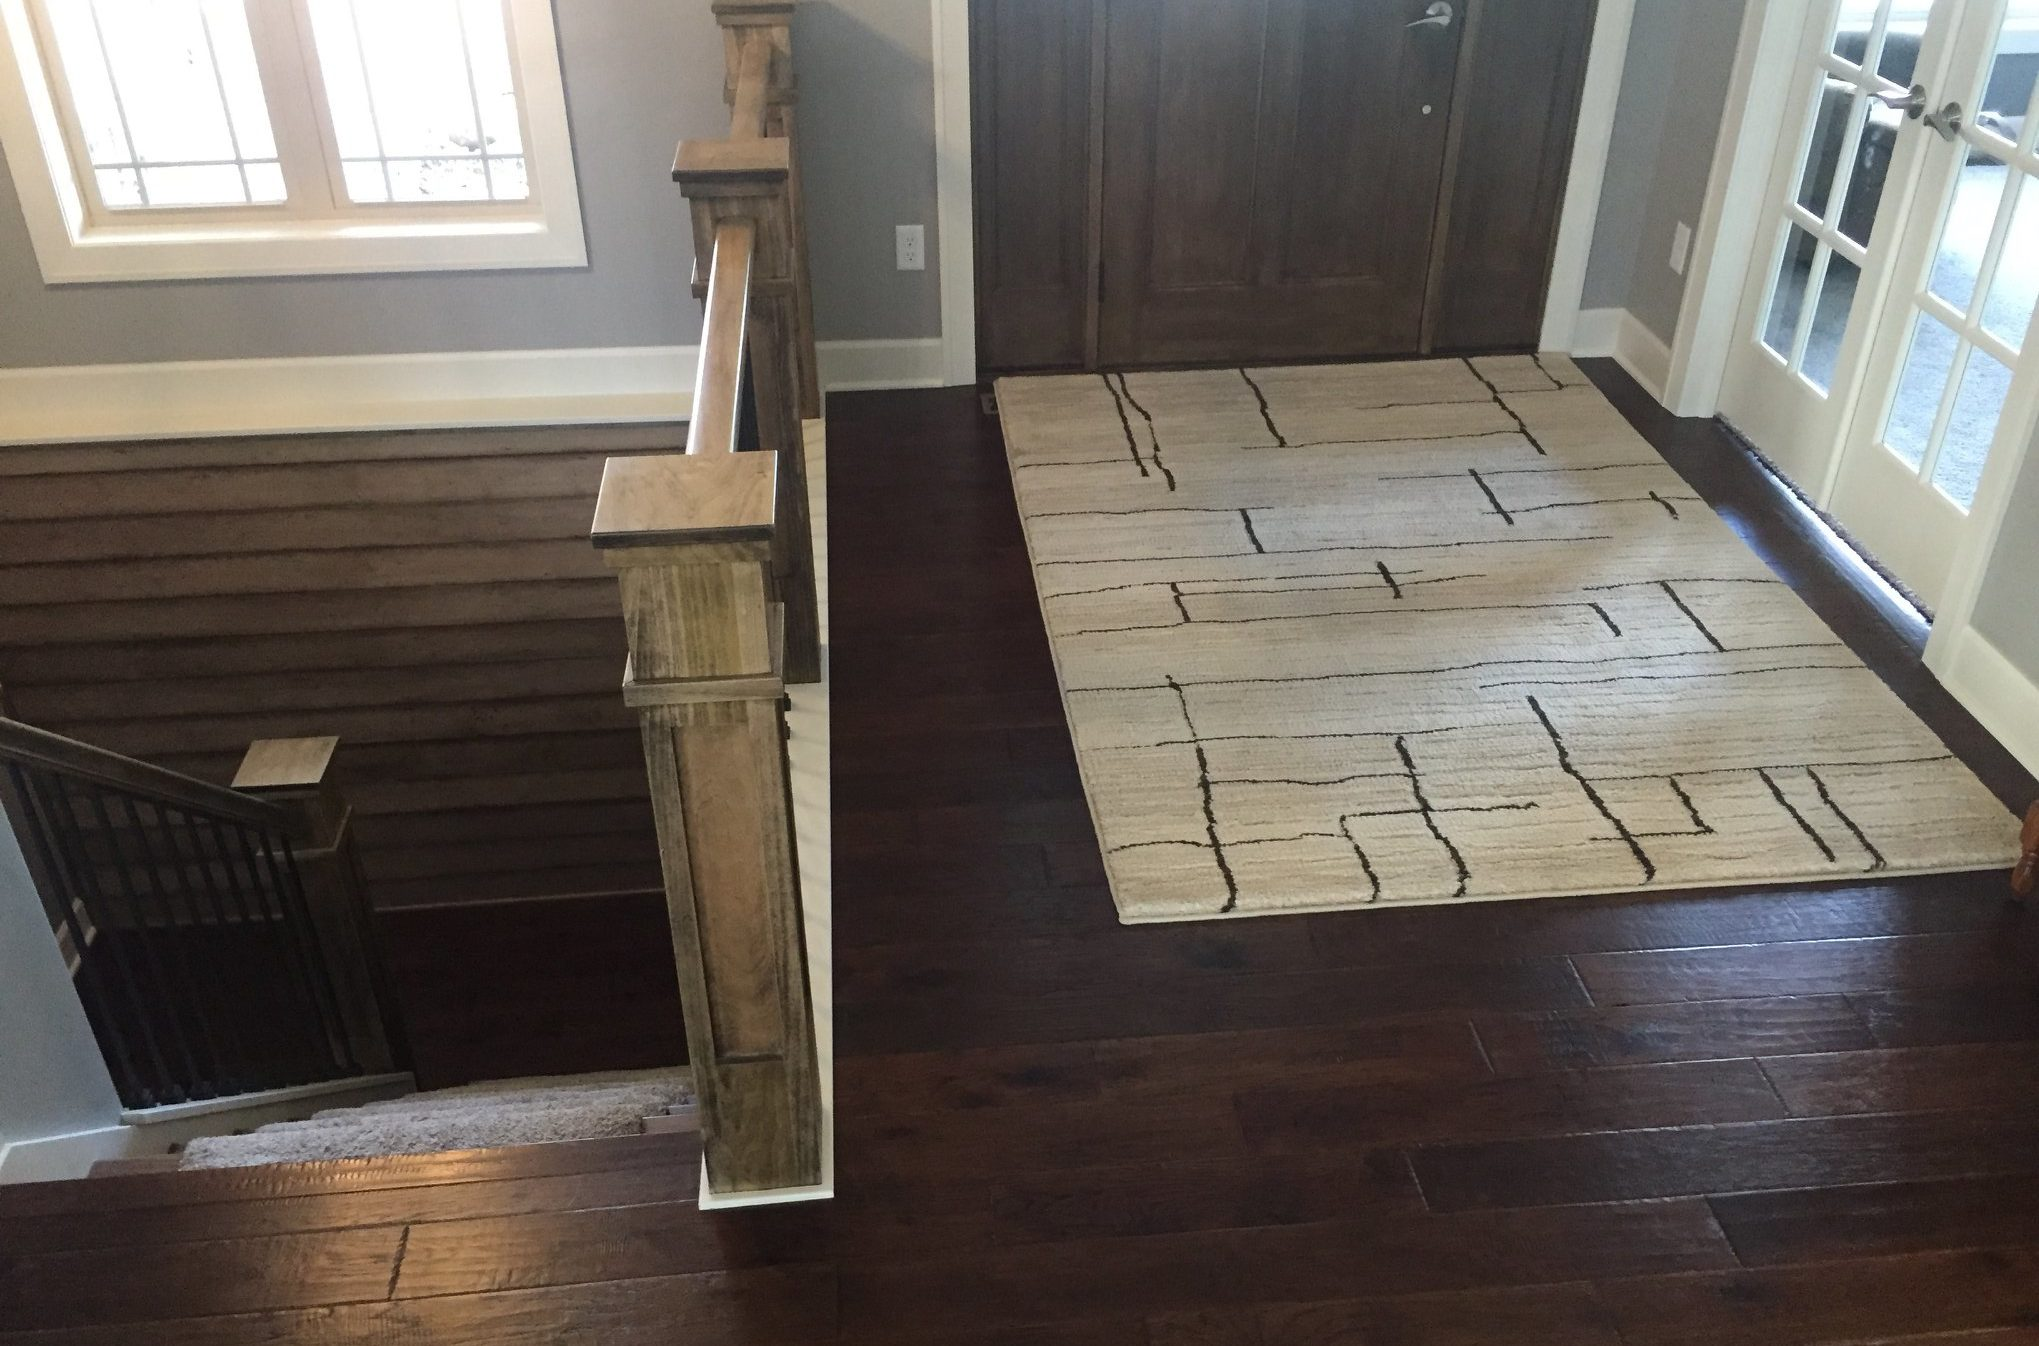 Local Flooring Installers